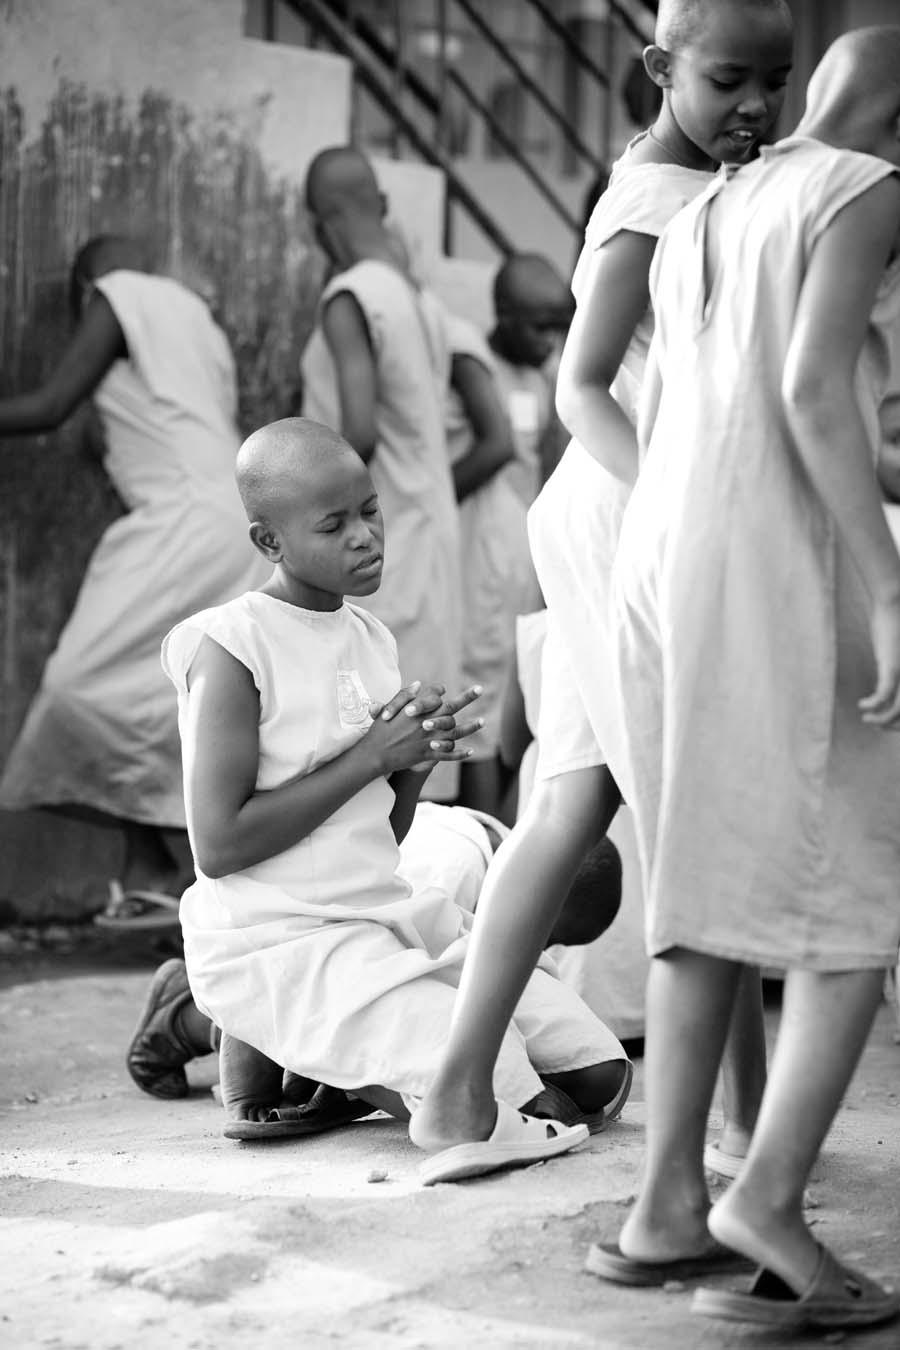 jessicadavisphotography.com | Jessica Davis Photography | Portrait Work in Uganda| Travel Photographer | World Event Photographs 3 (4).jpg